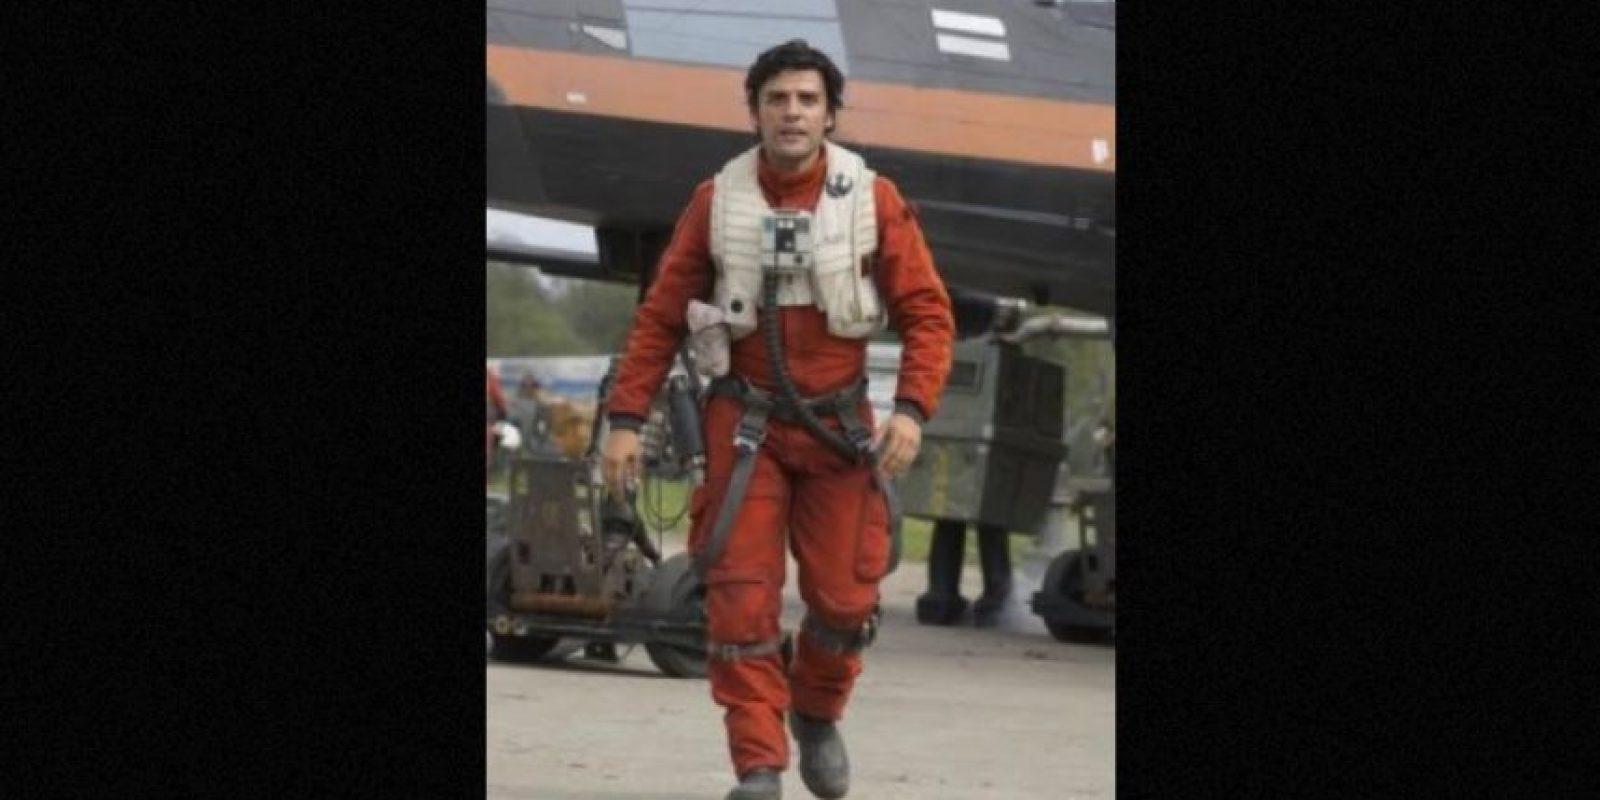 X-Wing Pilot Poe Dameron, interpretado por Oscar Isaac Foto:Lucasfilms